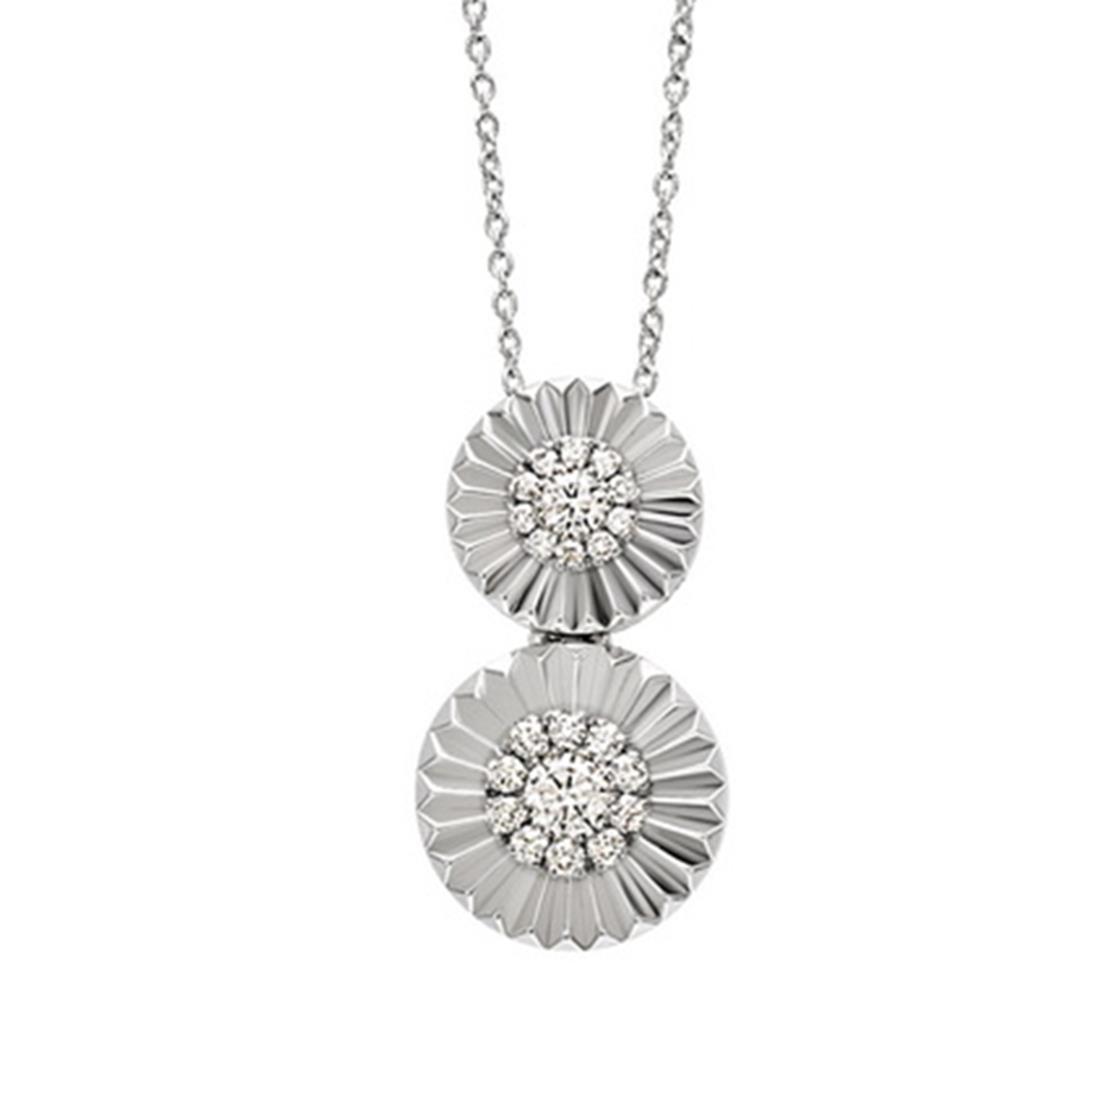 Collana con pendente con diamanti ct. 0,18 - BLISS